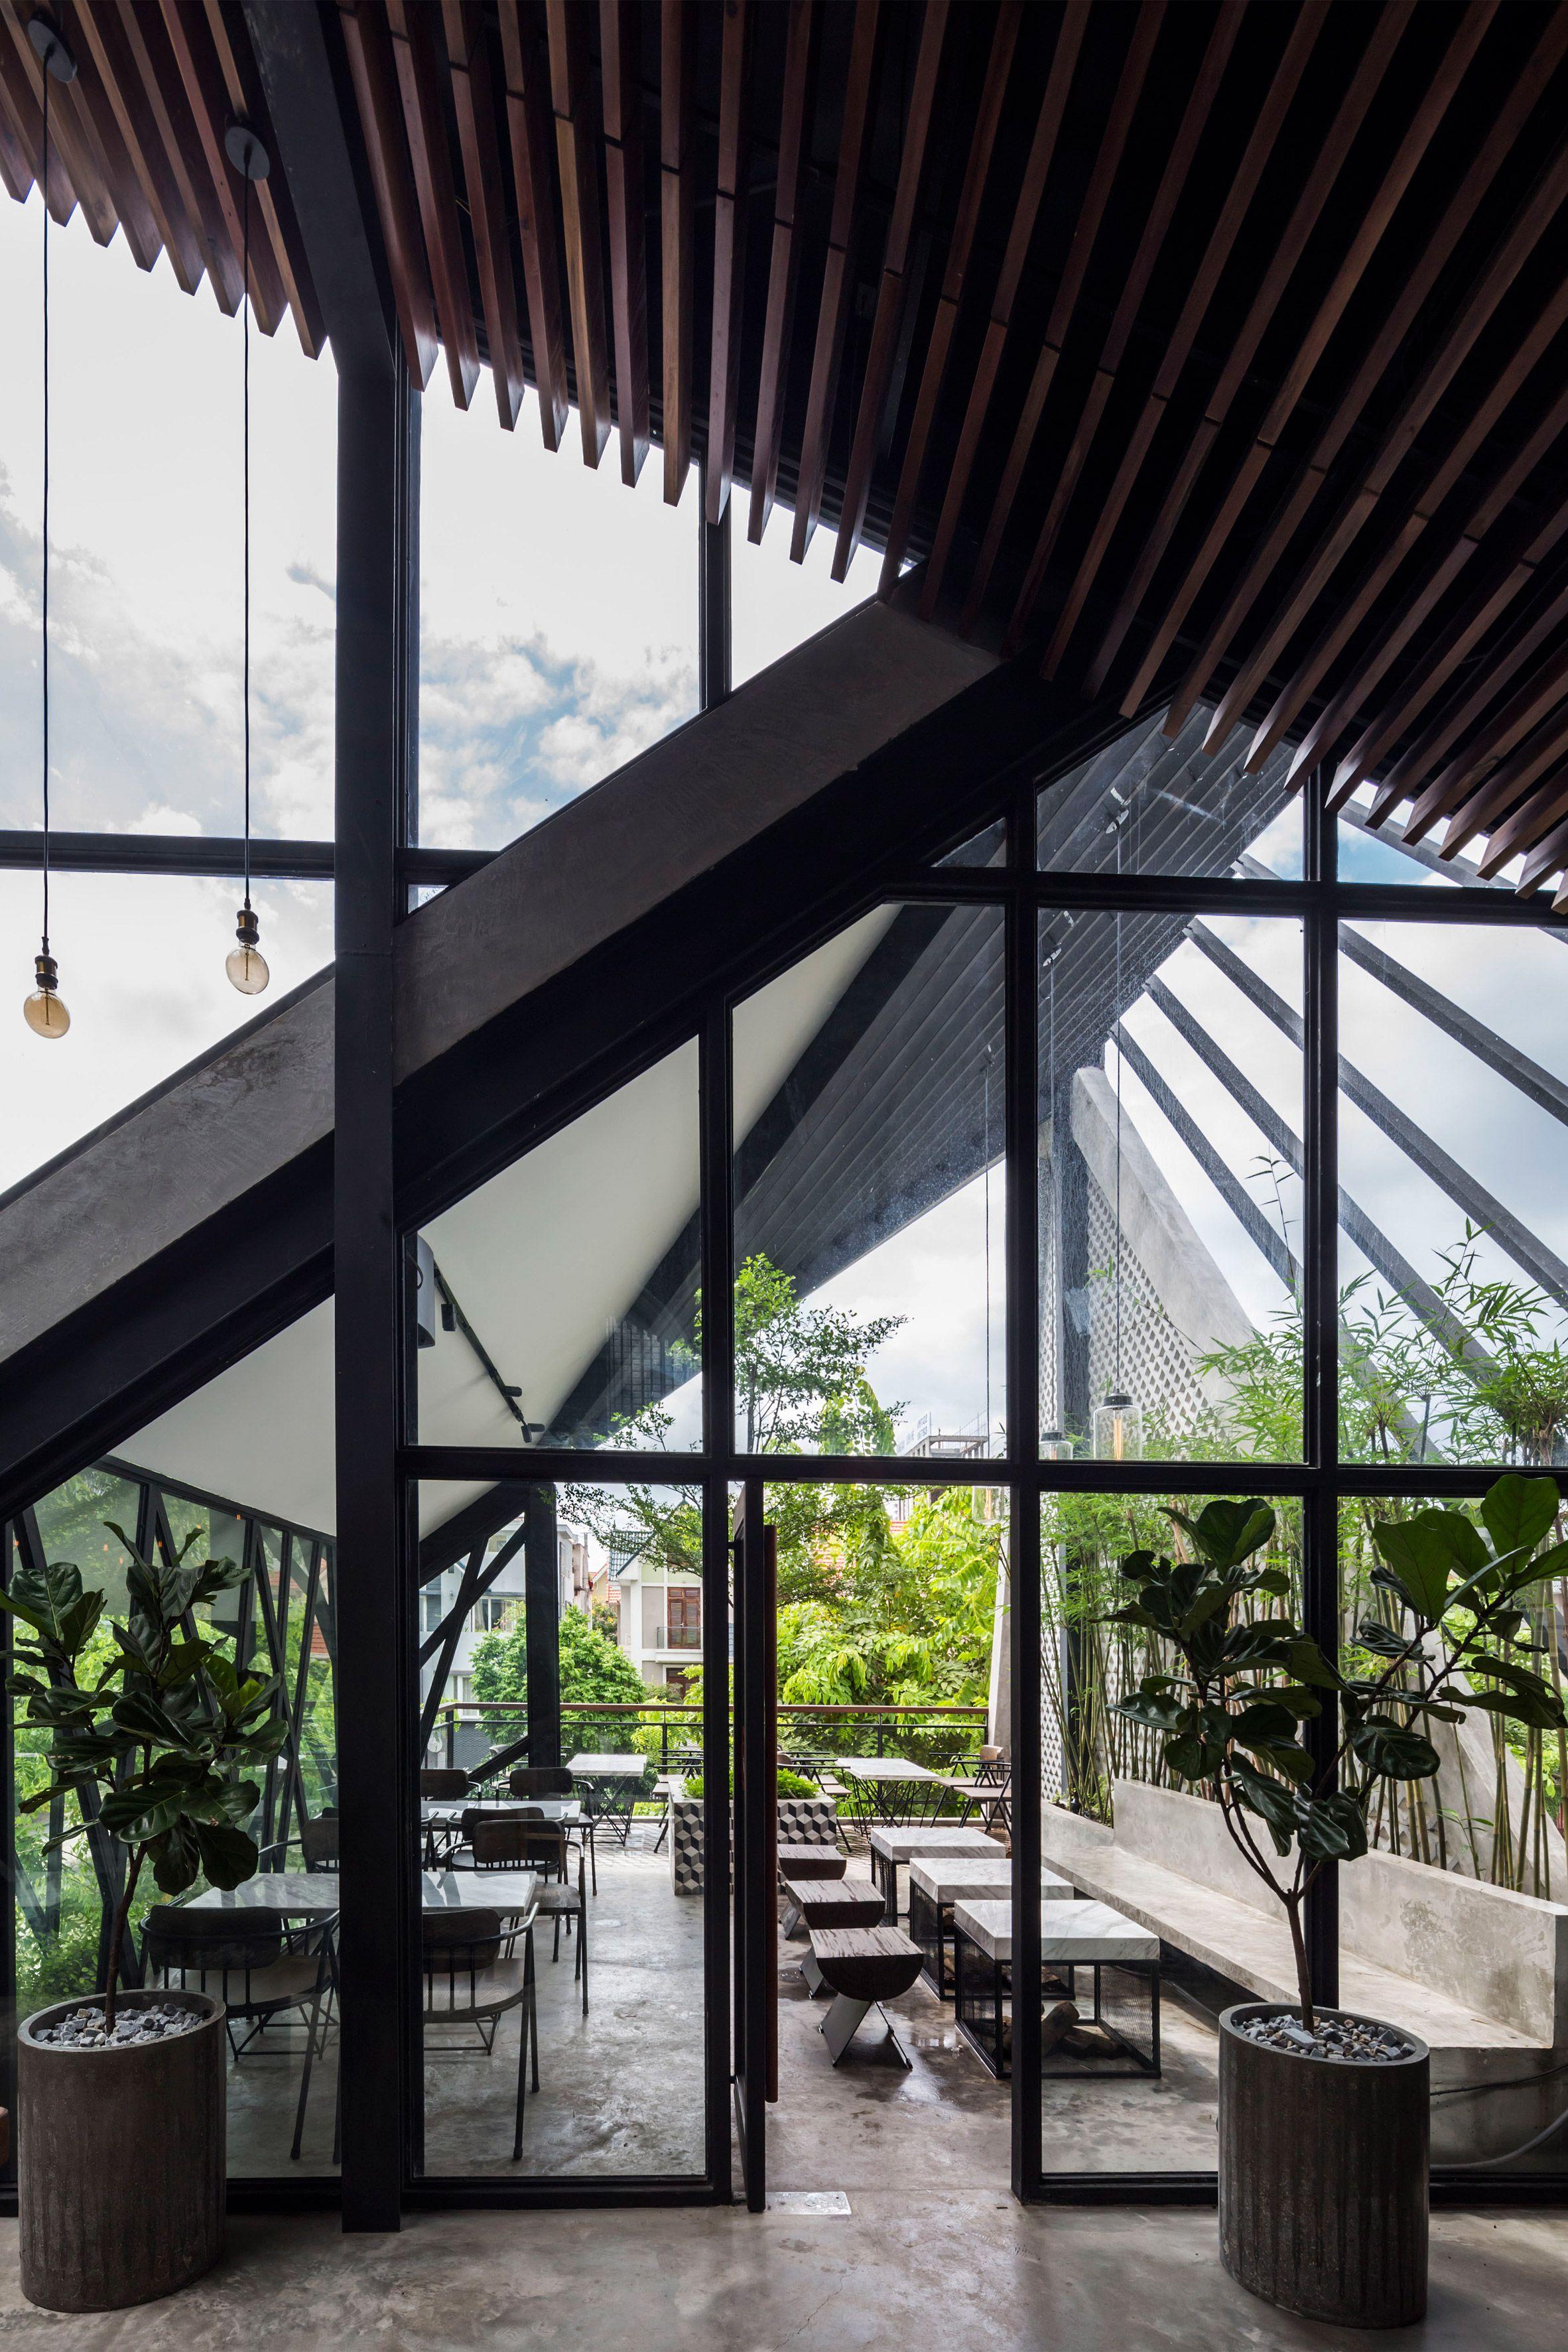 An Garden Cafe By Le House Cafe House Garden Cafe Architecture